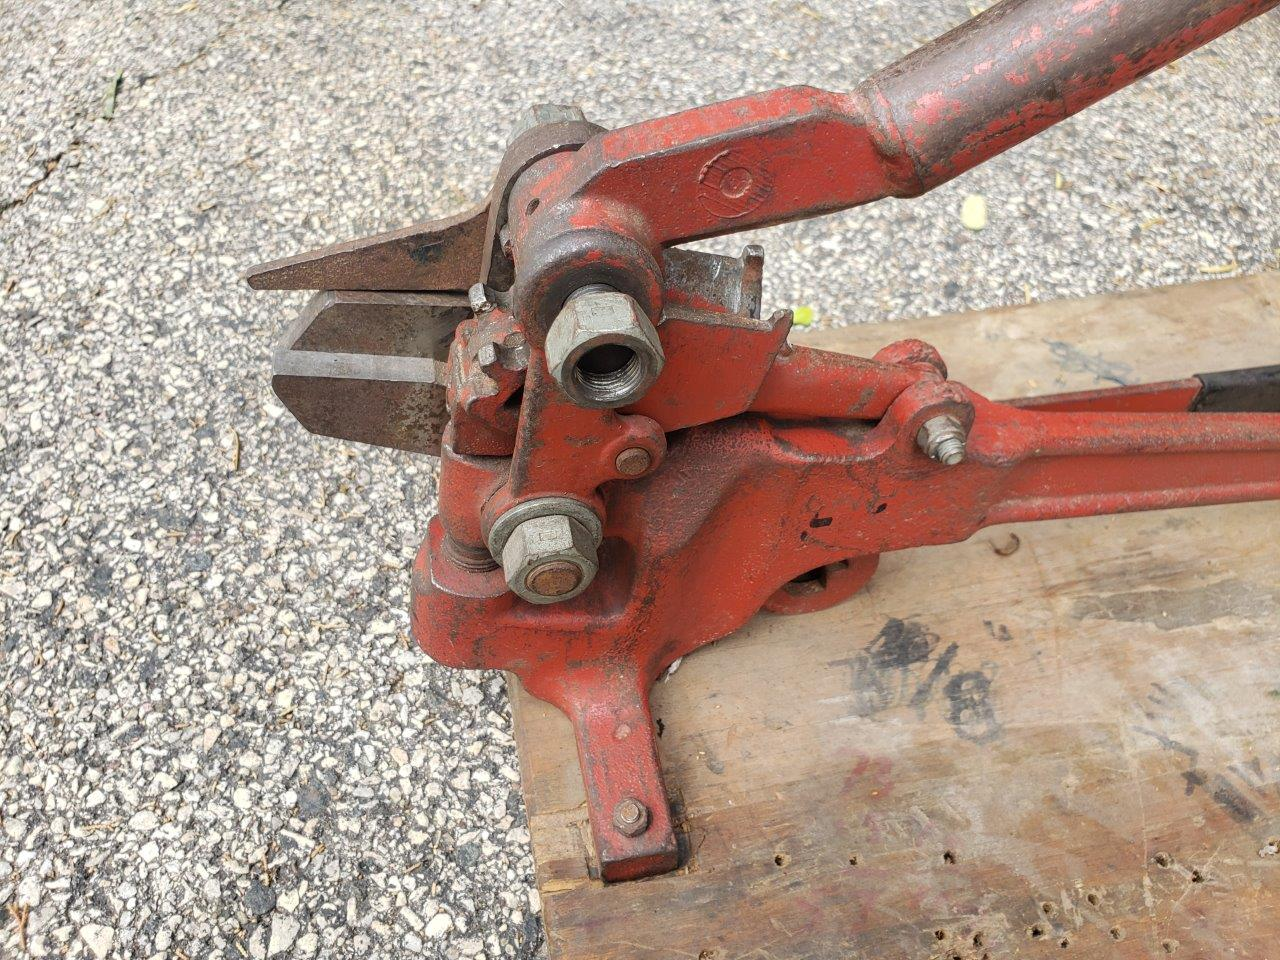 Shaw Bohn Combi Strapmaster 7 in 1 Tool Punch Model B Eagle Morlin